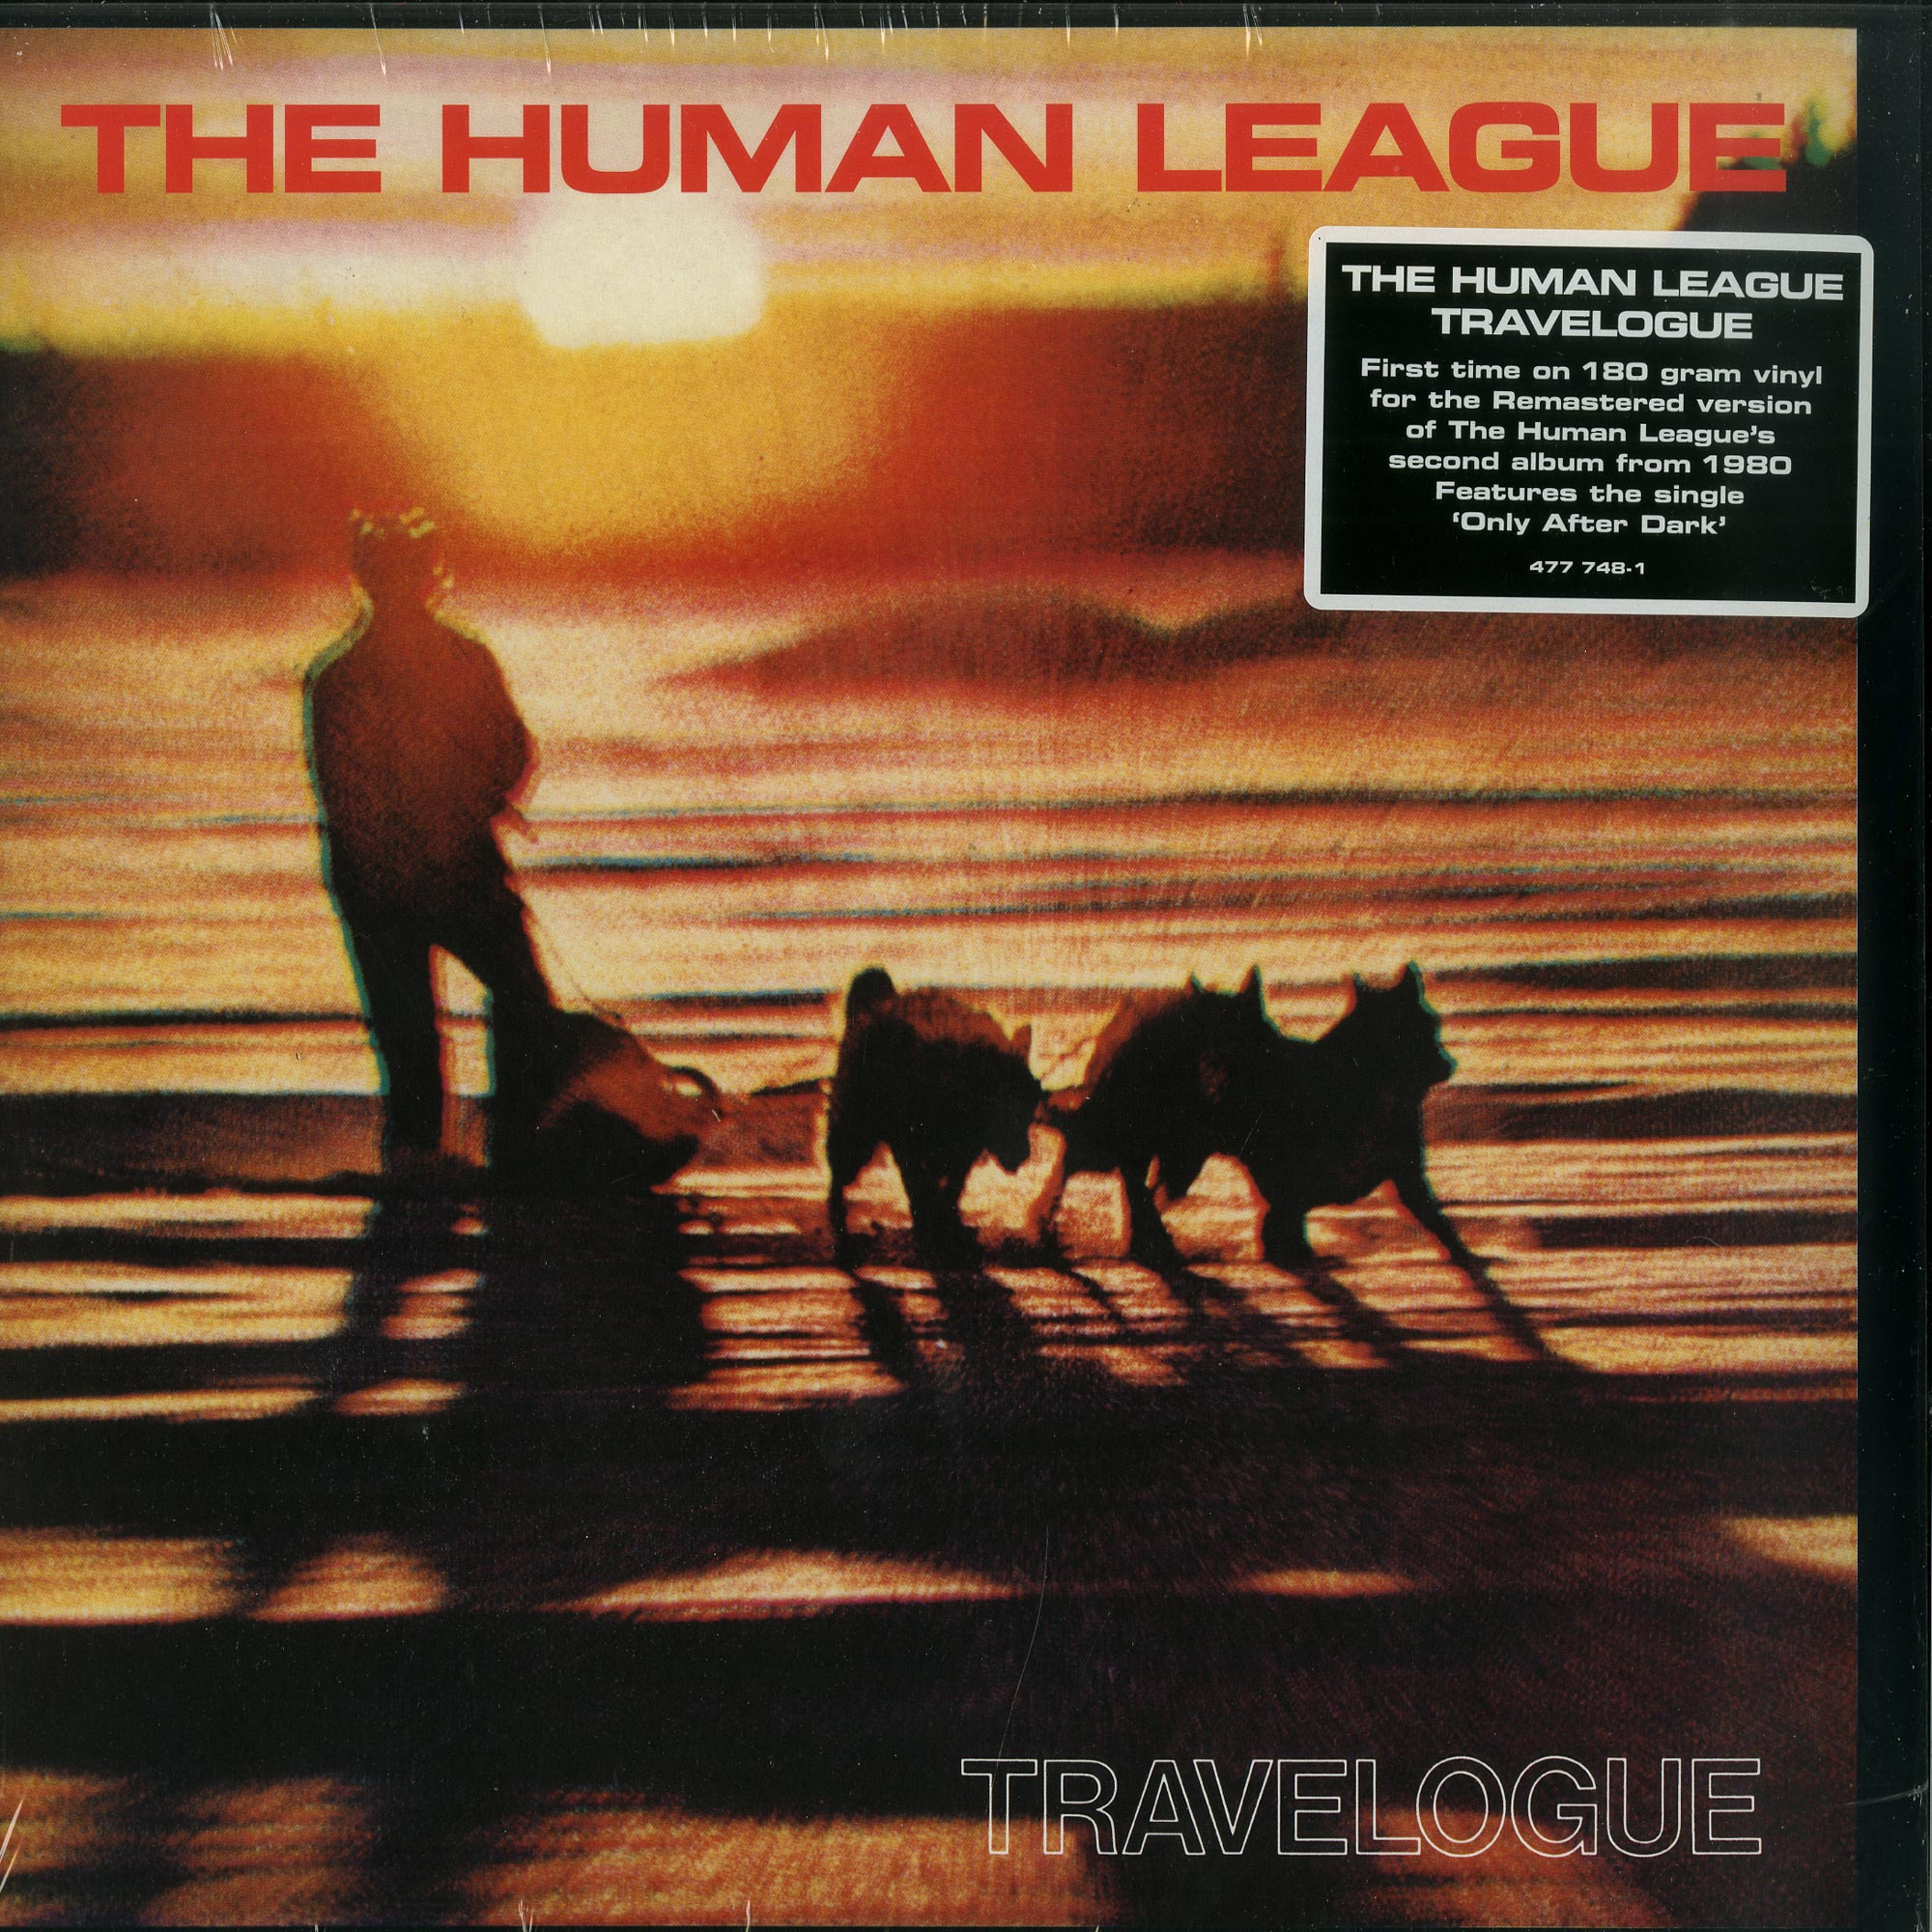 Human League - TRAVELOGUE